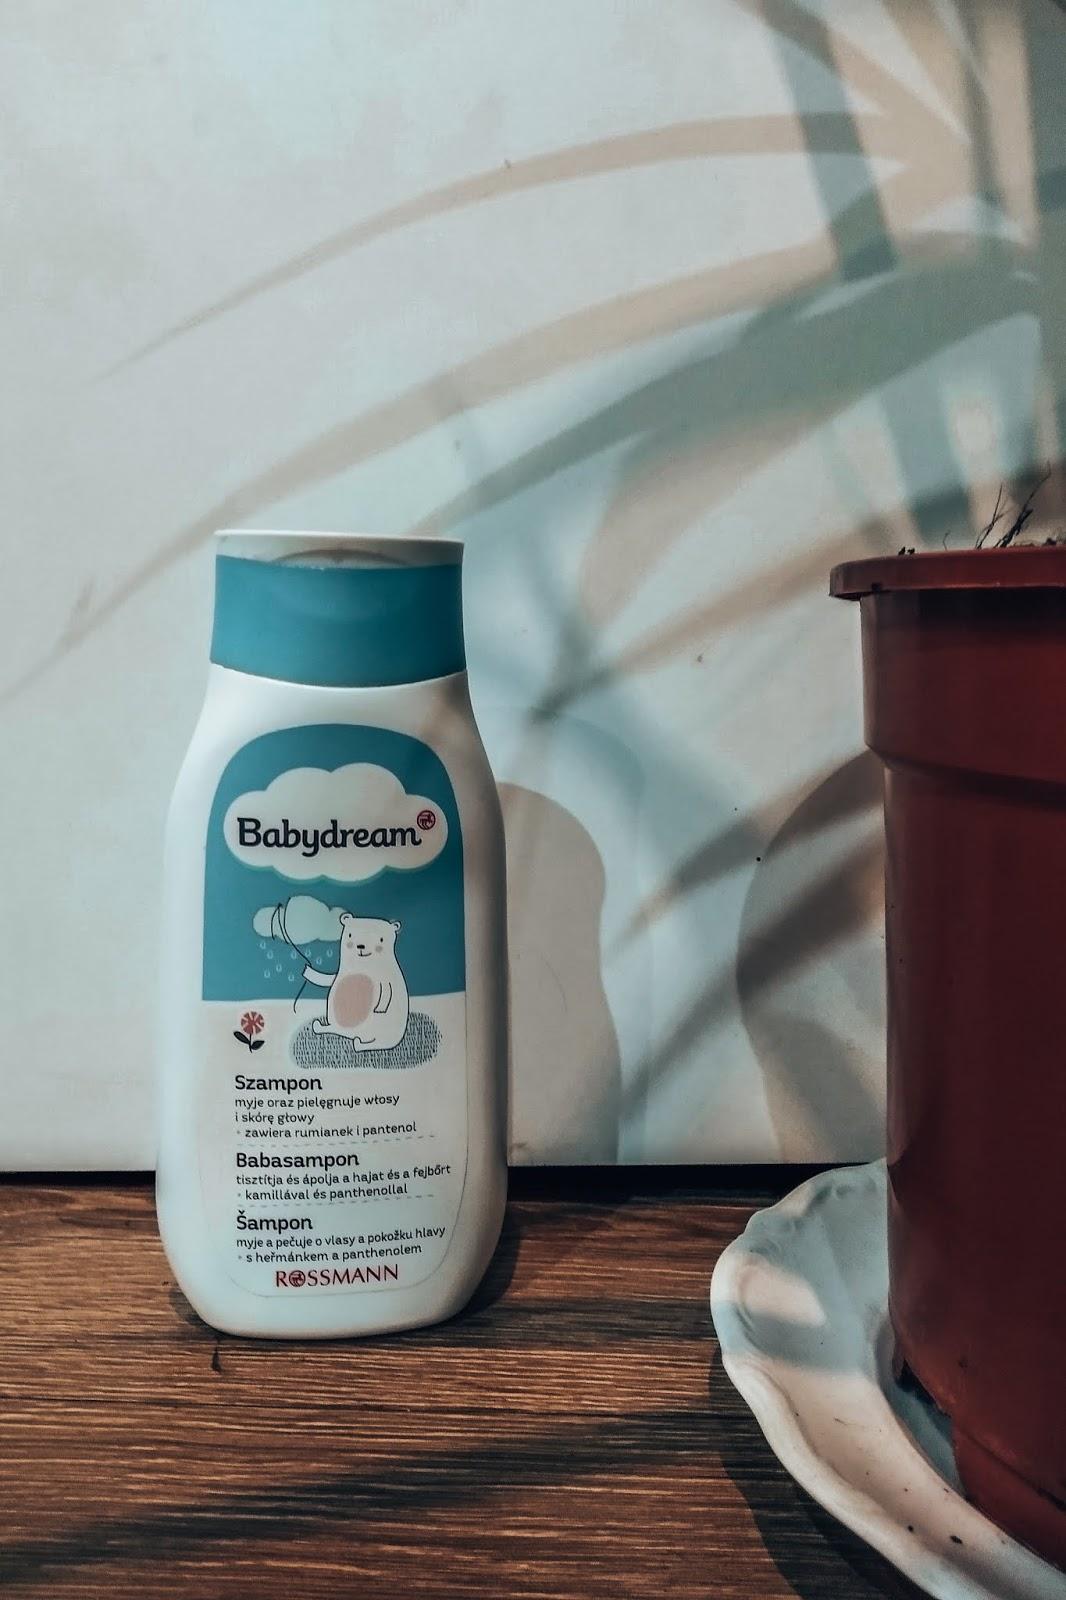 Babydream - łagodny szampon za grosze